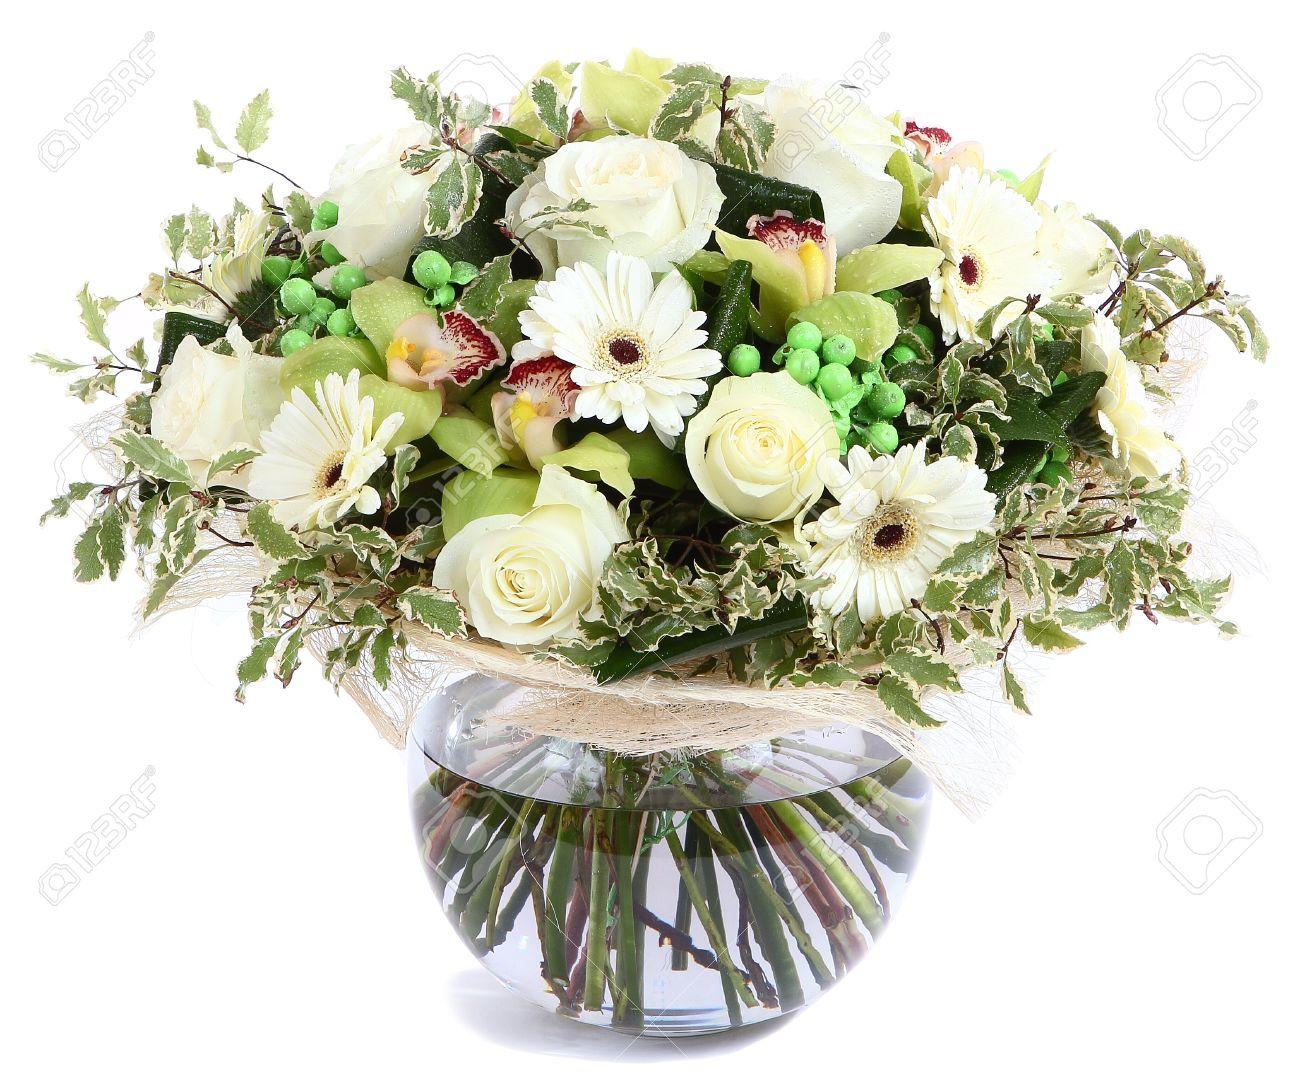 Flower arrangement in glass transparent vase white roses orchids flower arrangement in glass transparent vase white roses orchids white gerbera daisies izmirmasajfo